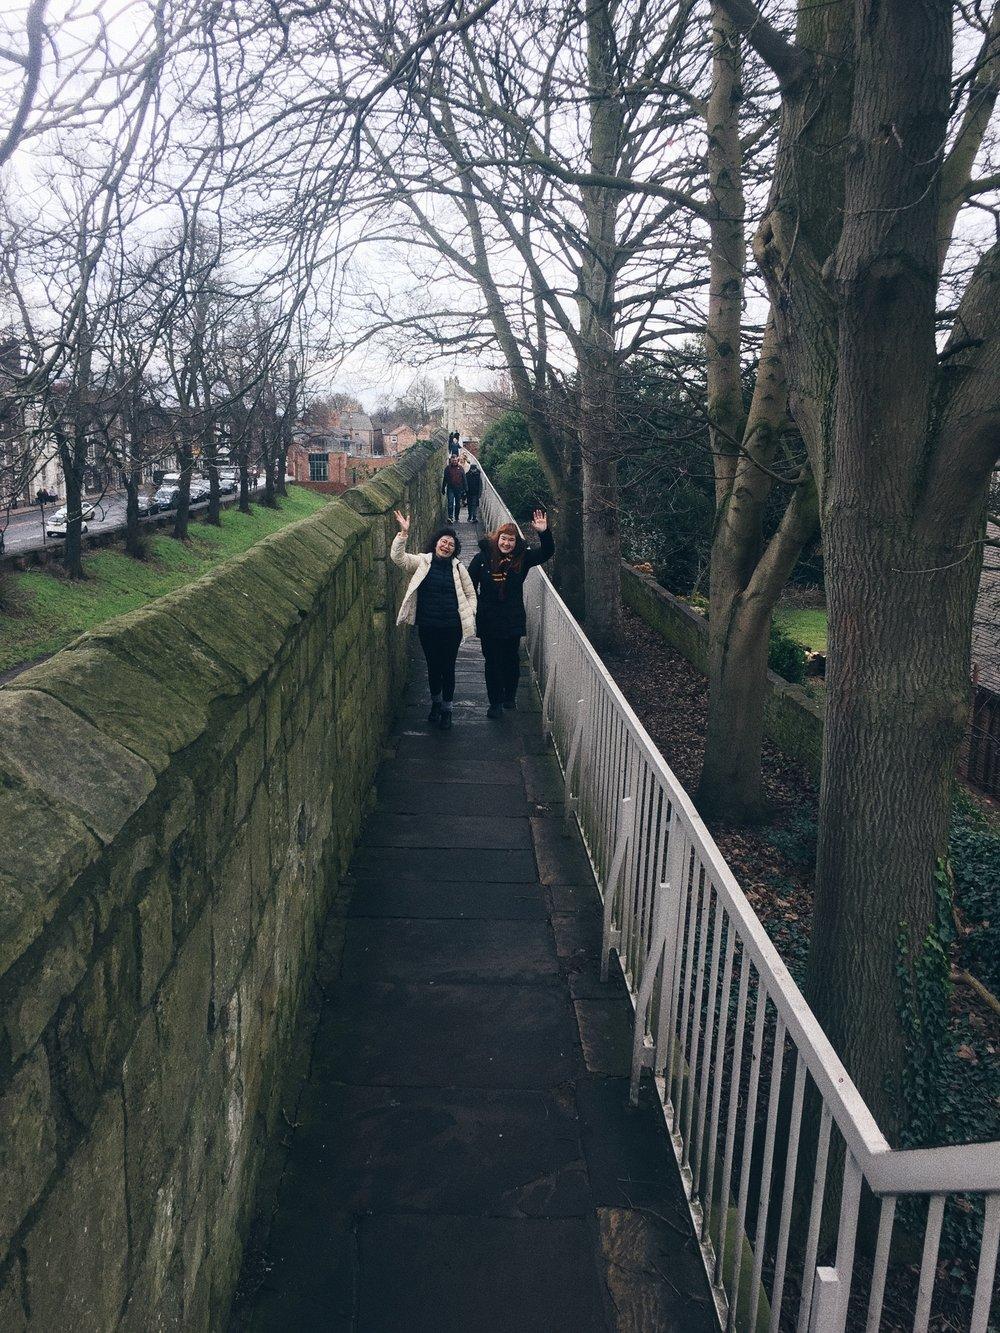 York city walls - aunt & cousin.jpg